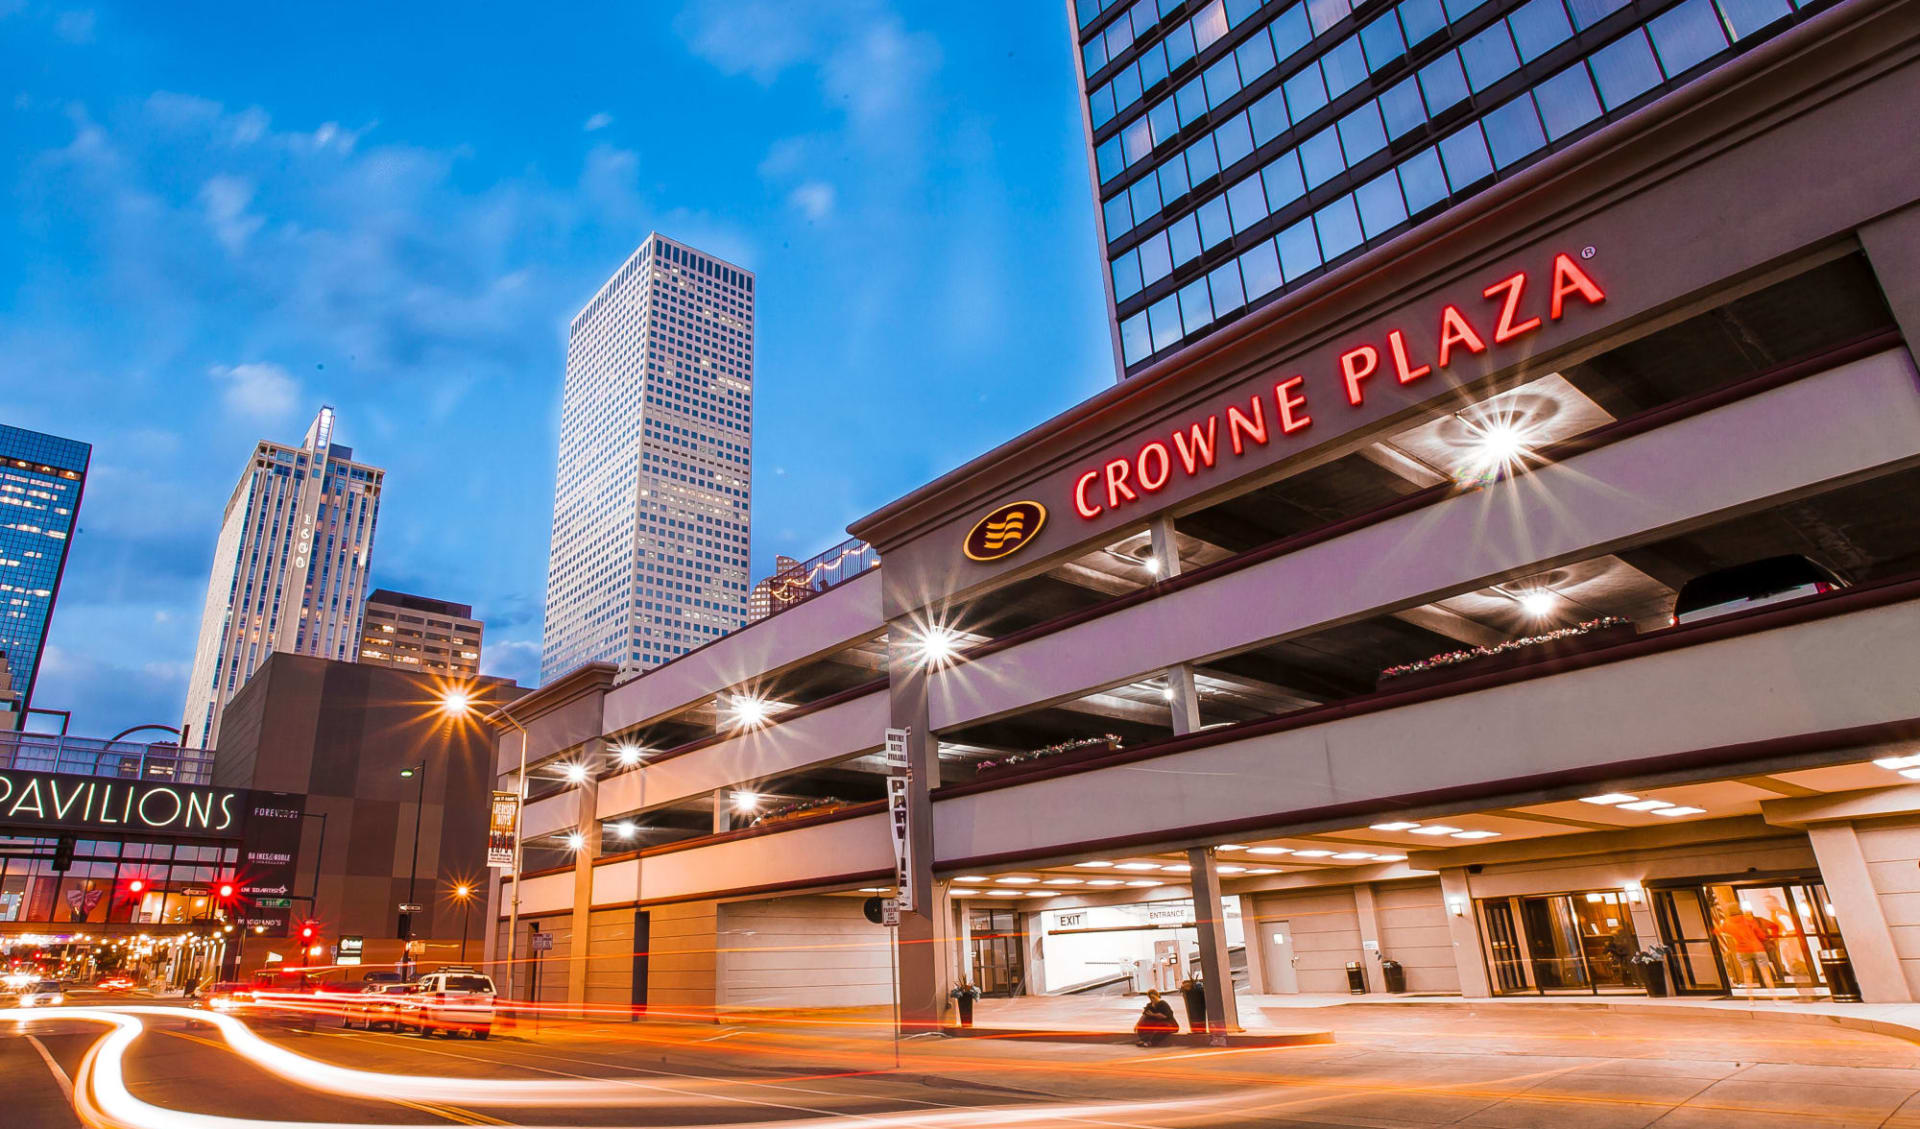 Sonesta Denver:  Crowne Plaza Denver - long exposure evening